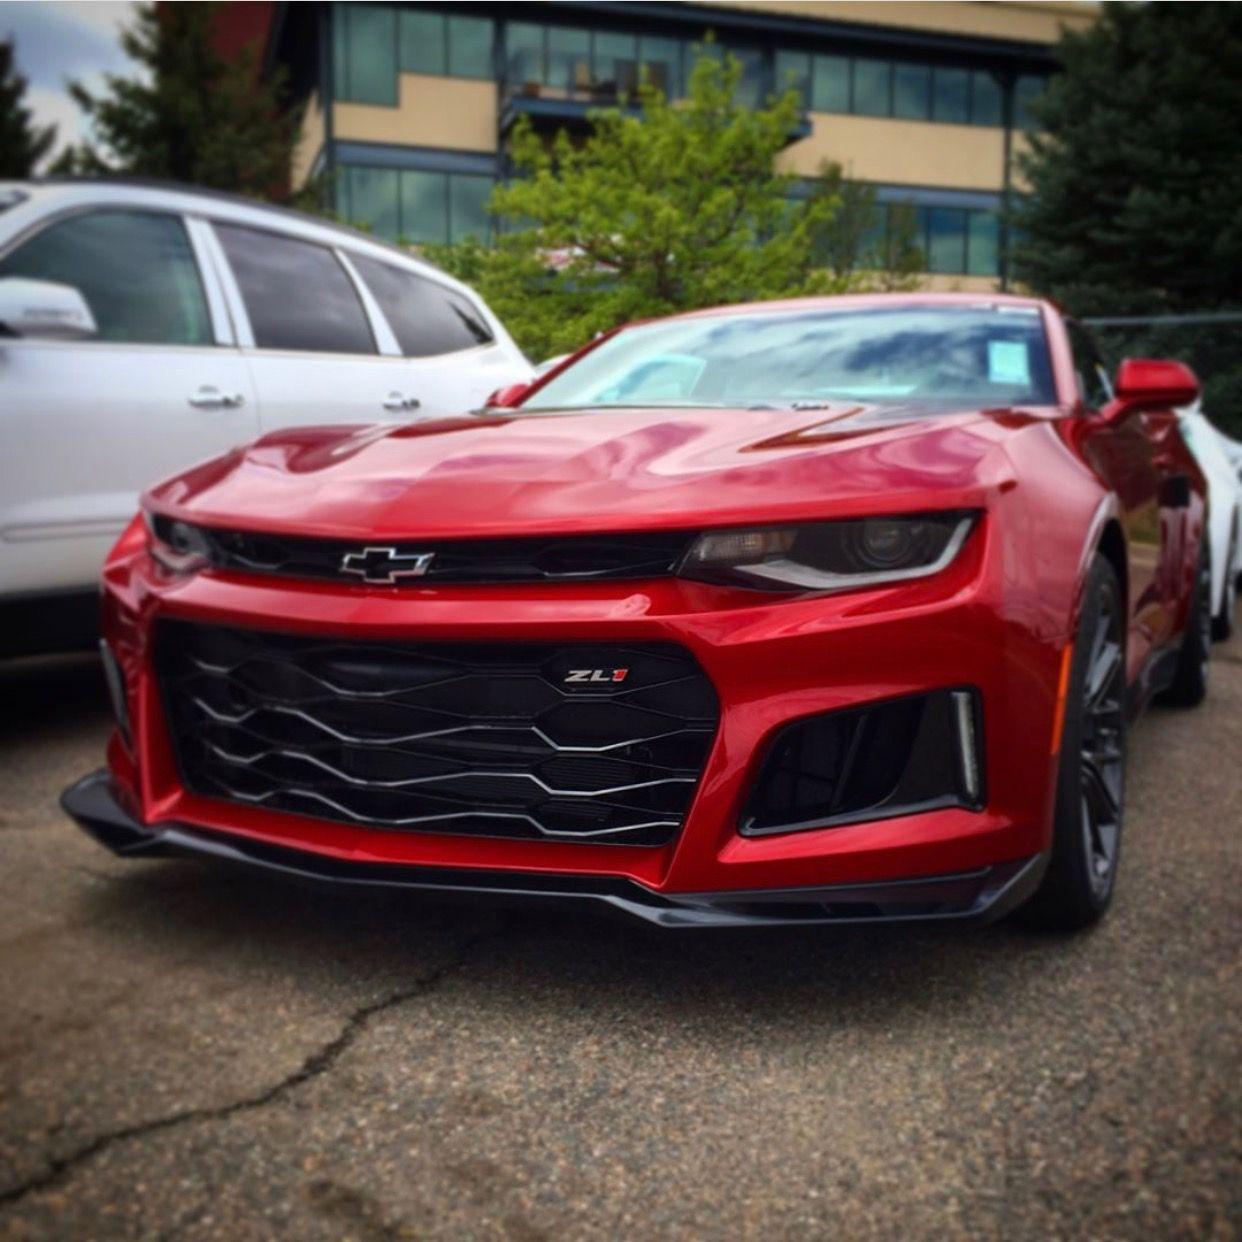 Chevrolet Camaro Zl1 Painted In Garnet Red Photo Taken By